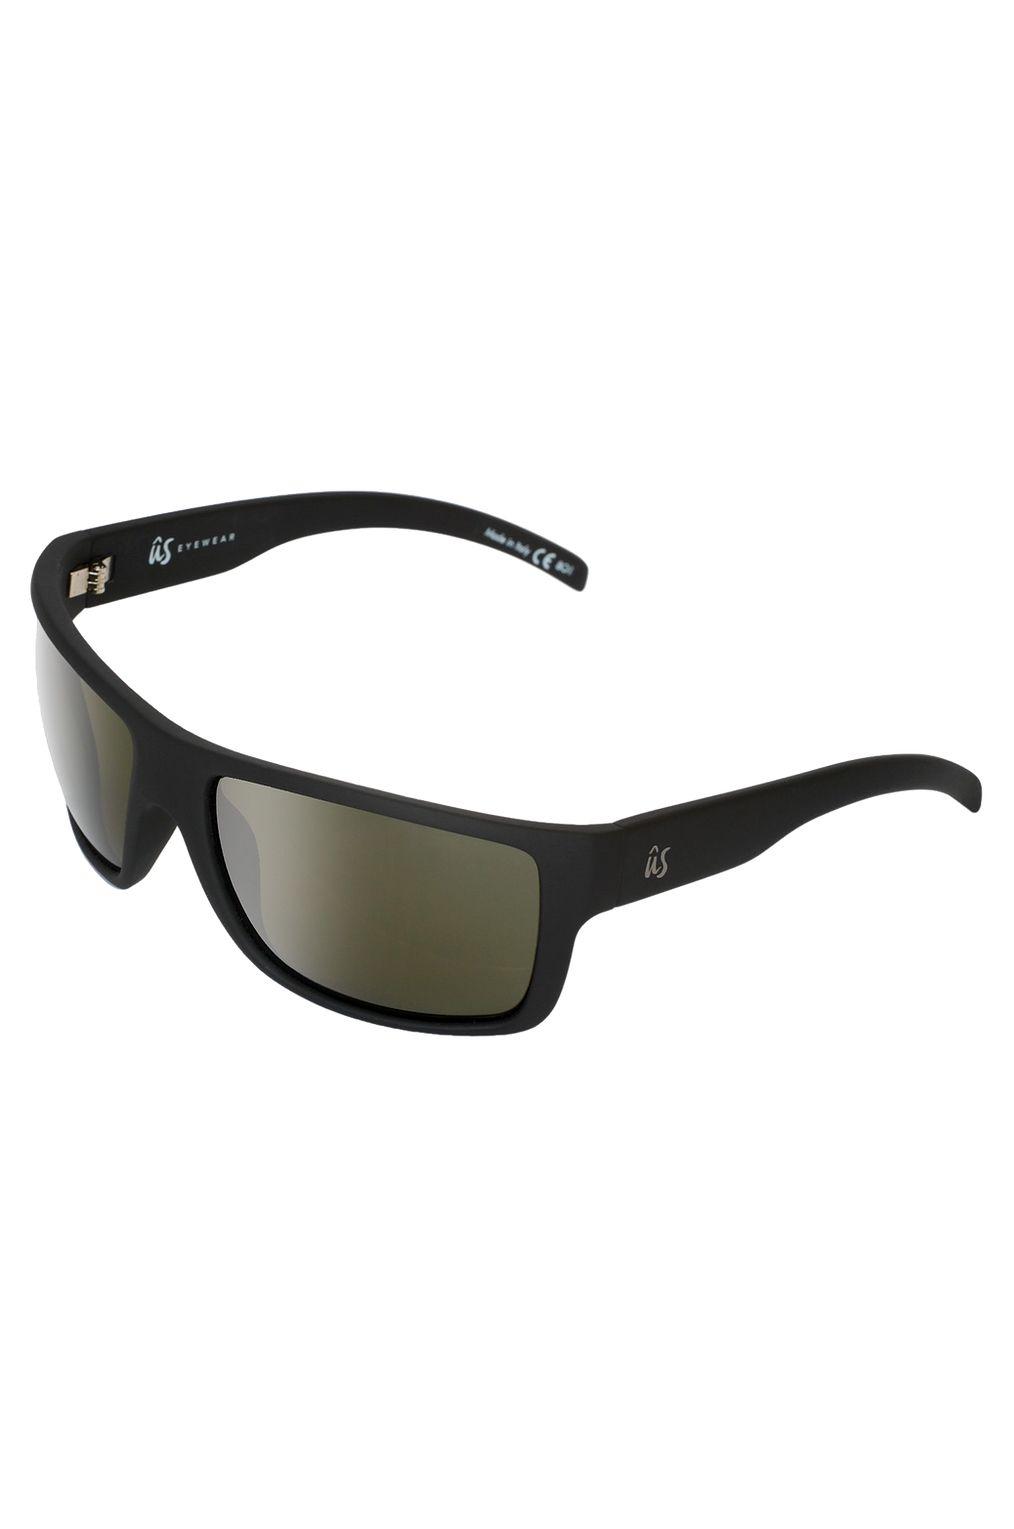 Oculos US TATOU Matte Black/Vintage Grey Polarized